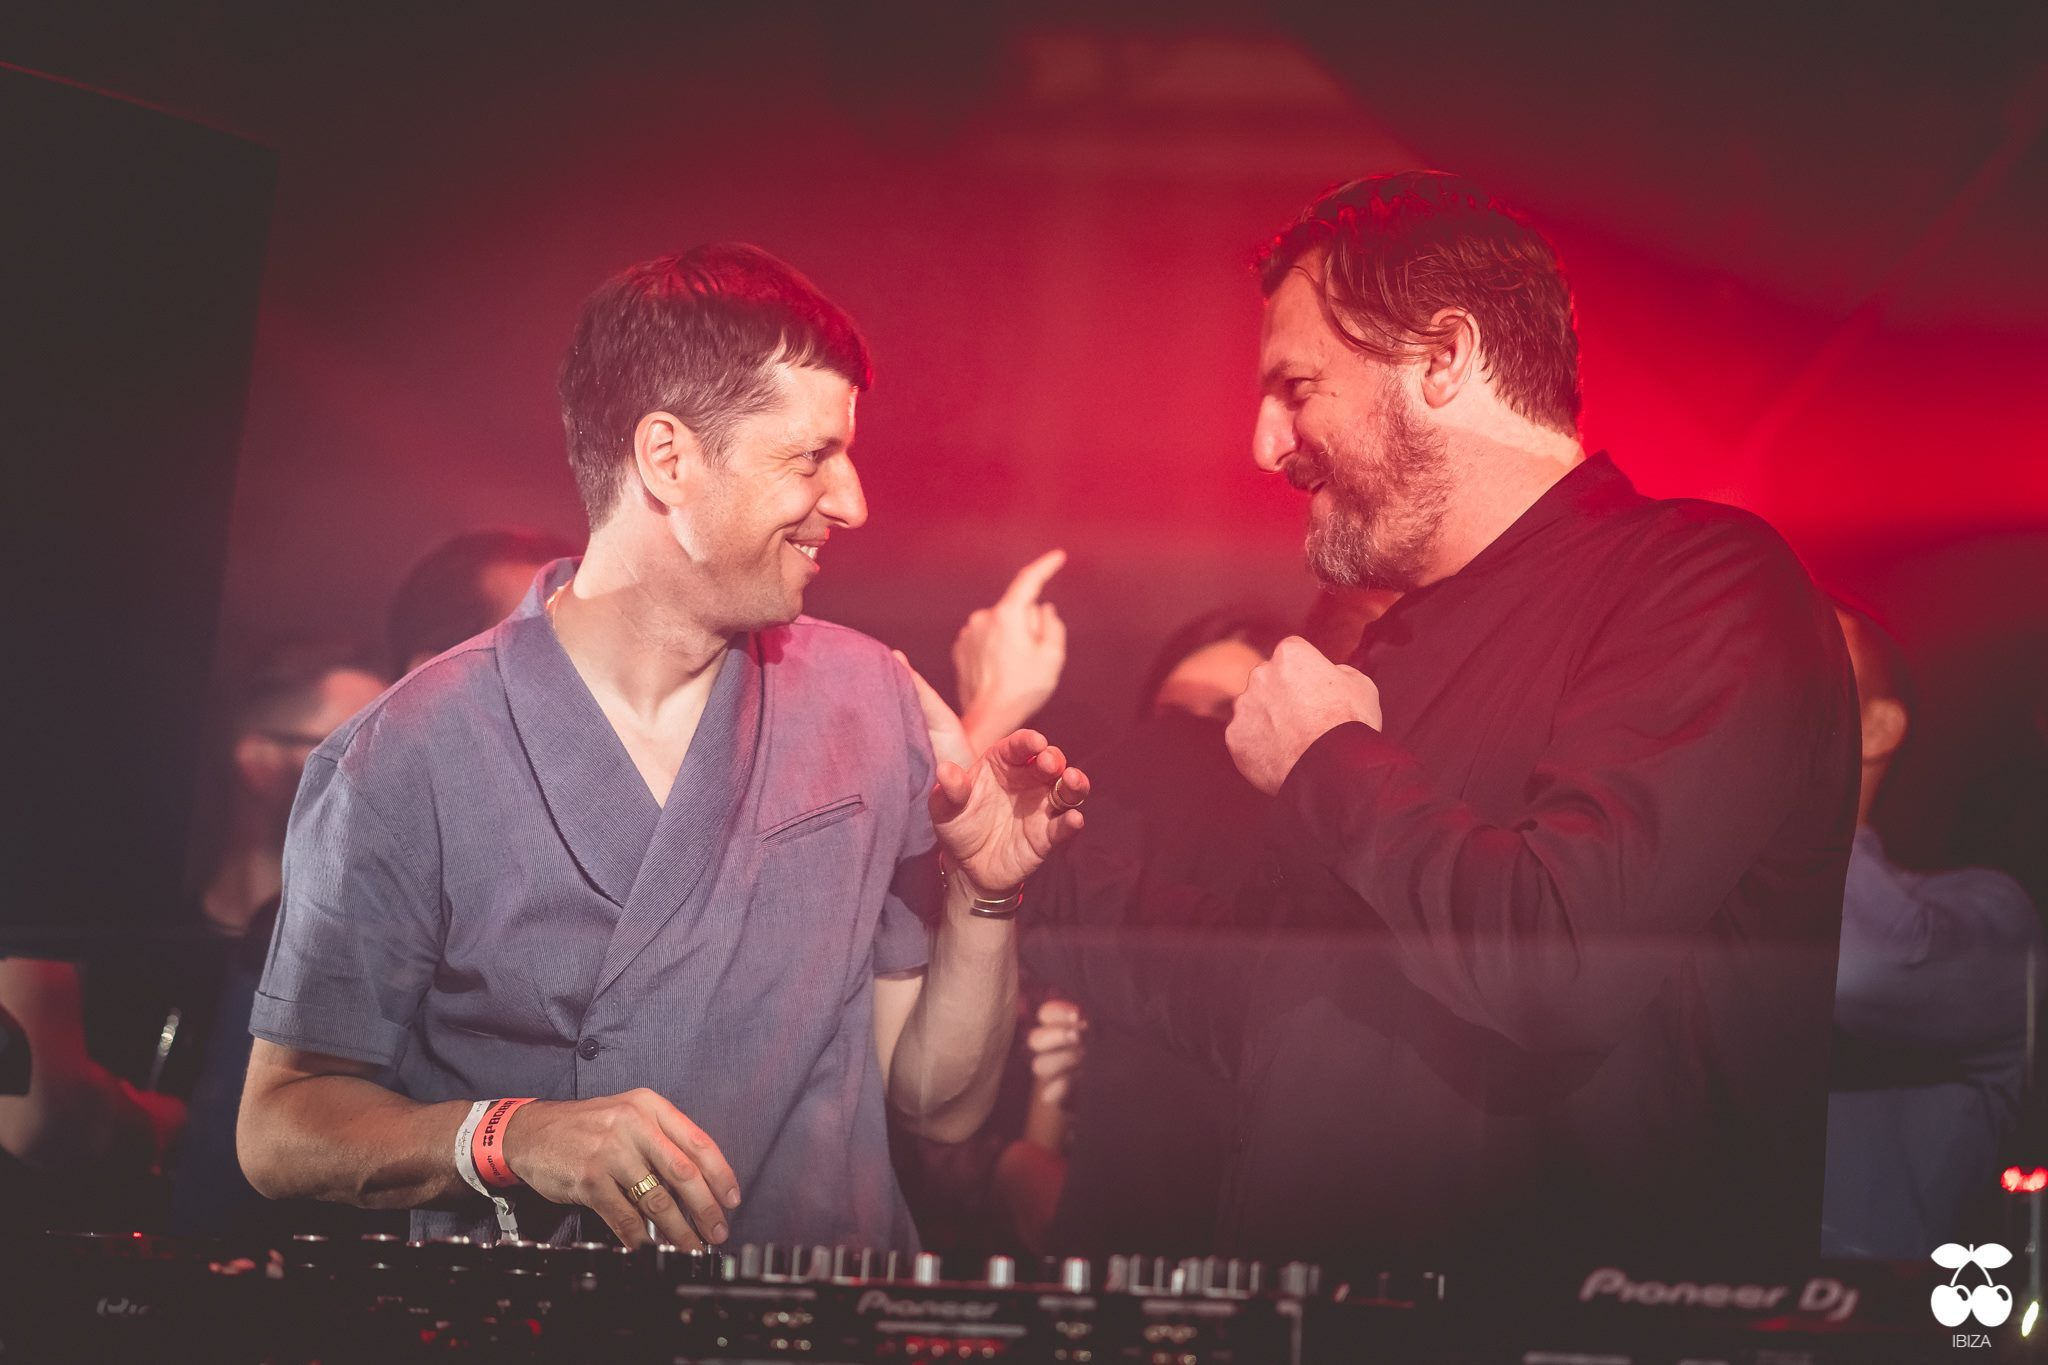 Solomun & dixon nightclub Pacha ibiza, party Ibiza